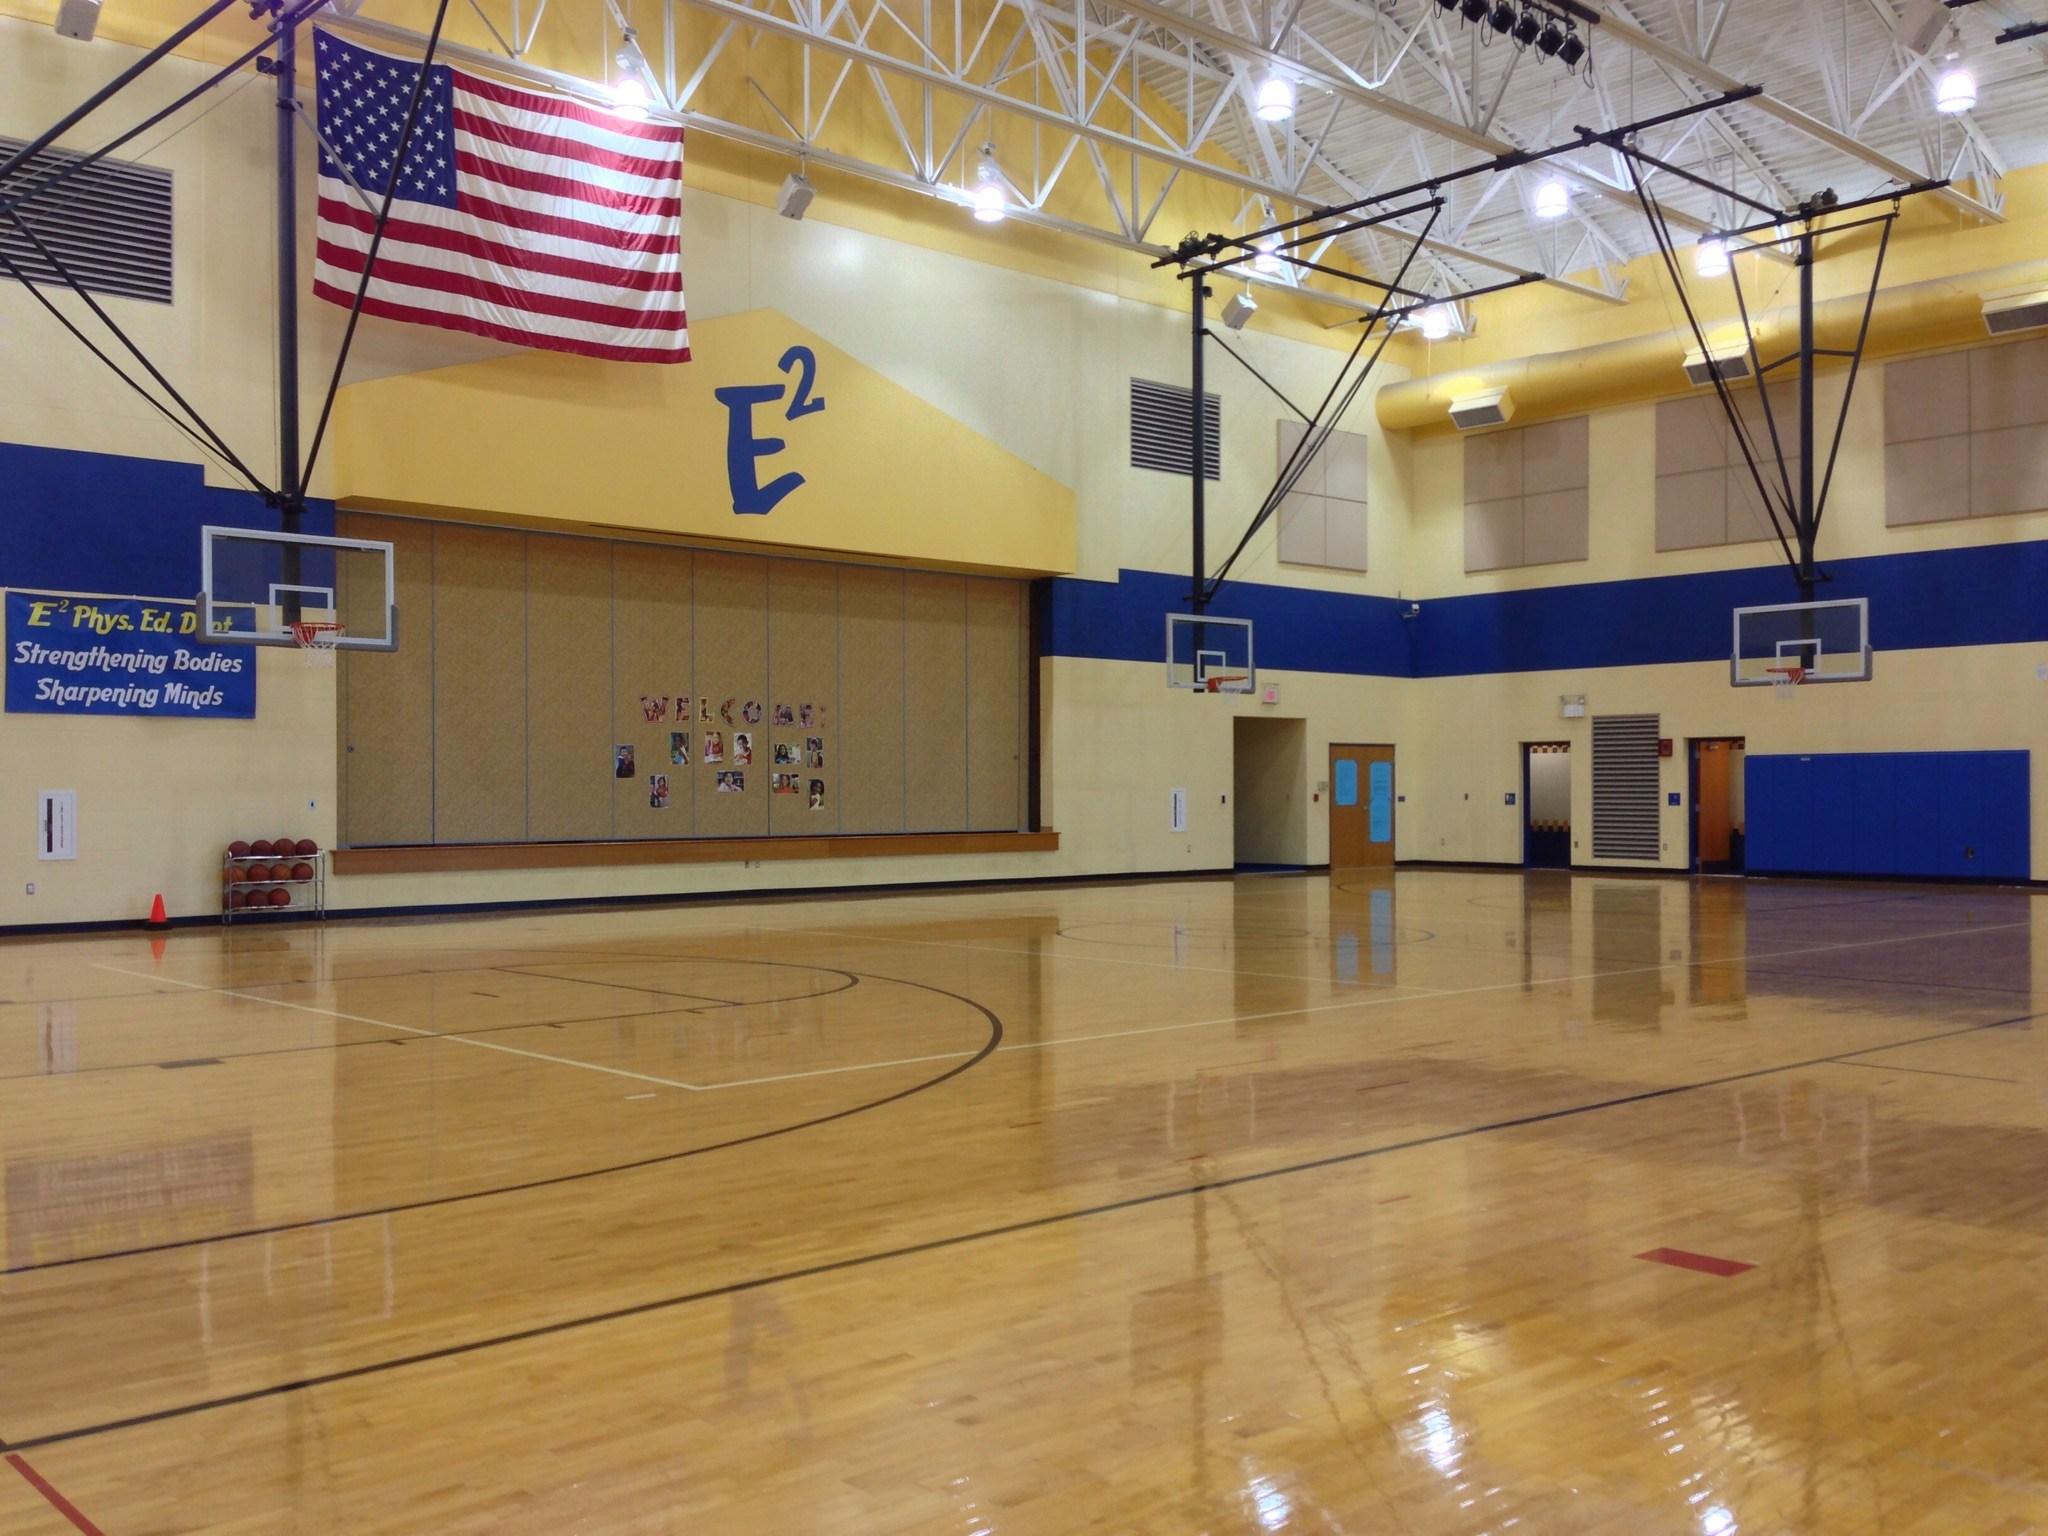 Eastside Elementary gym.